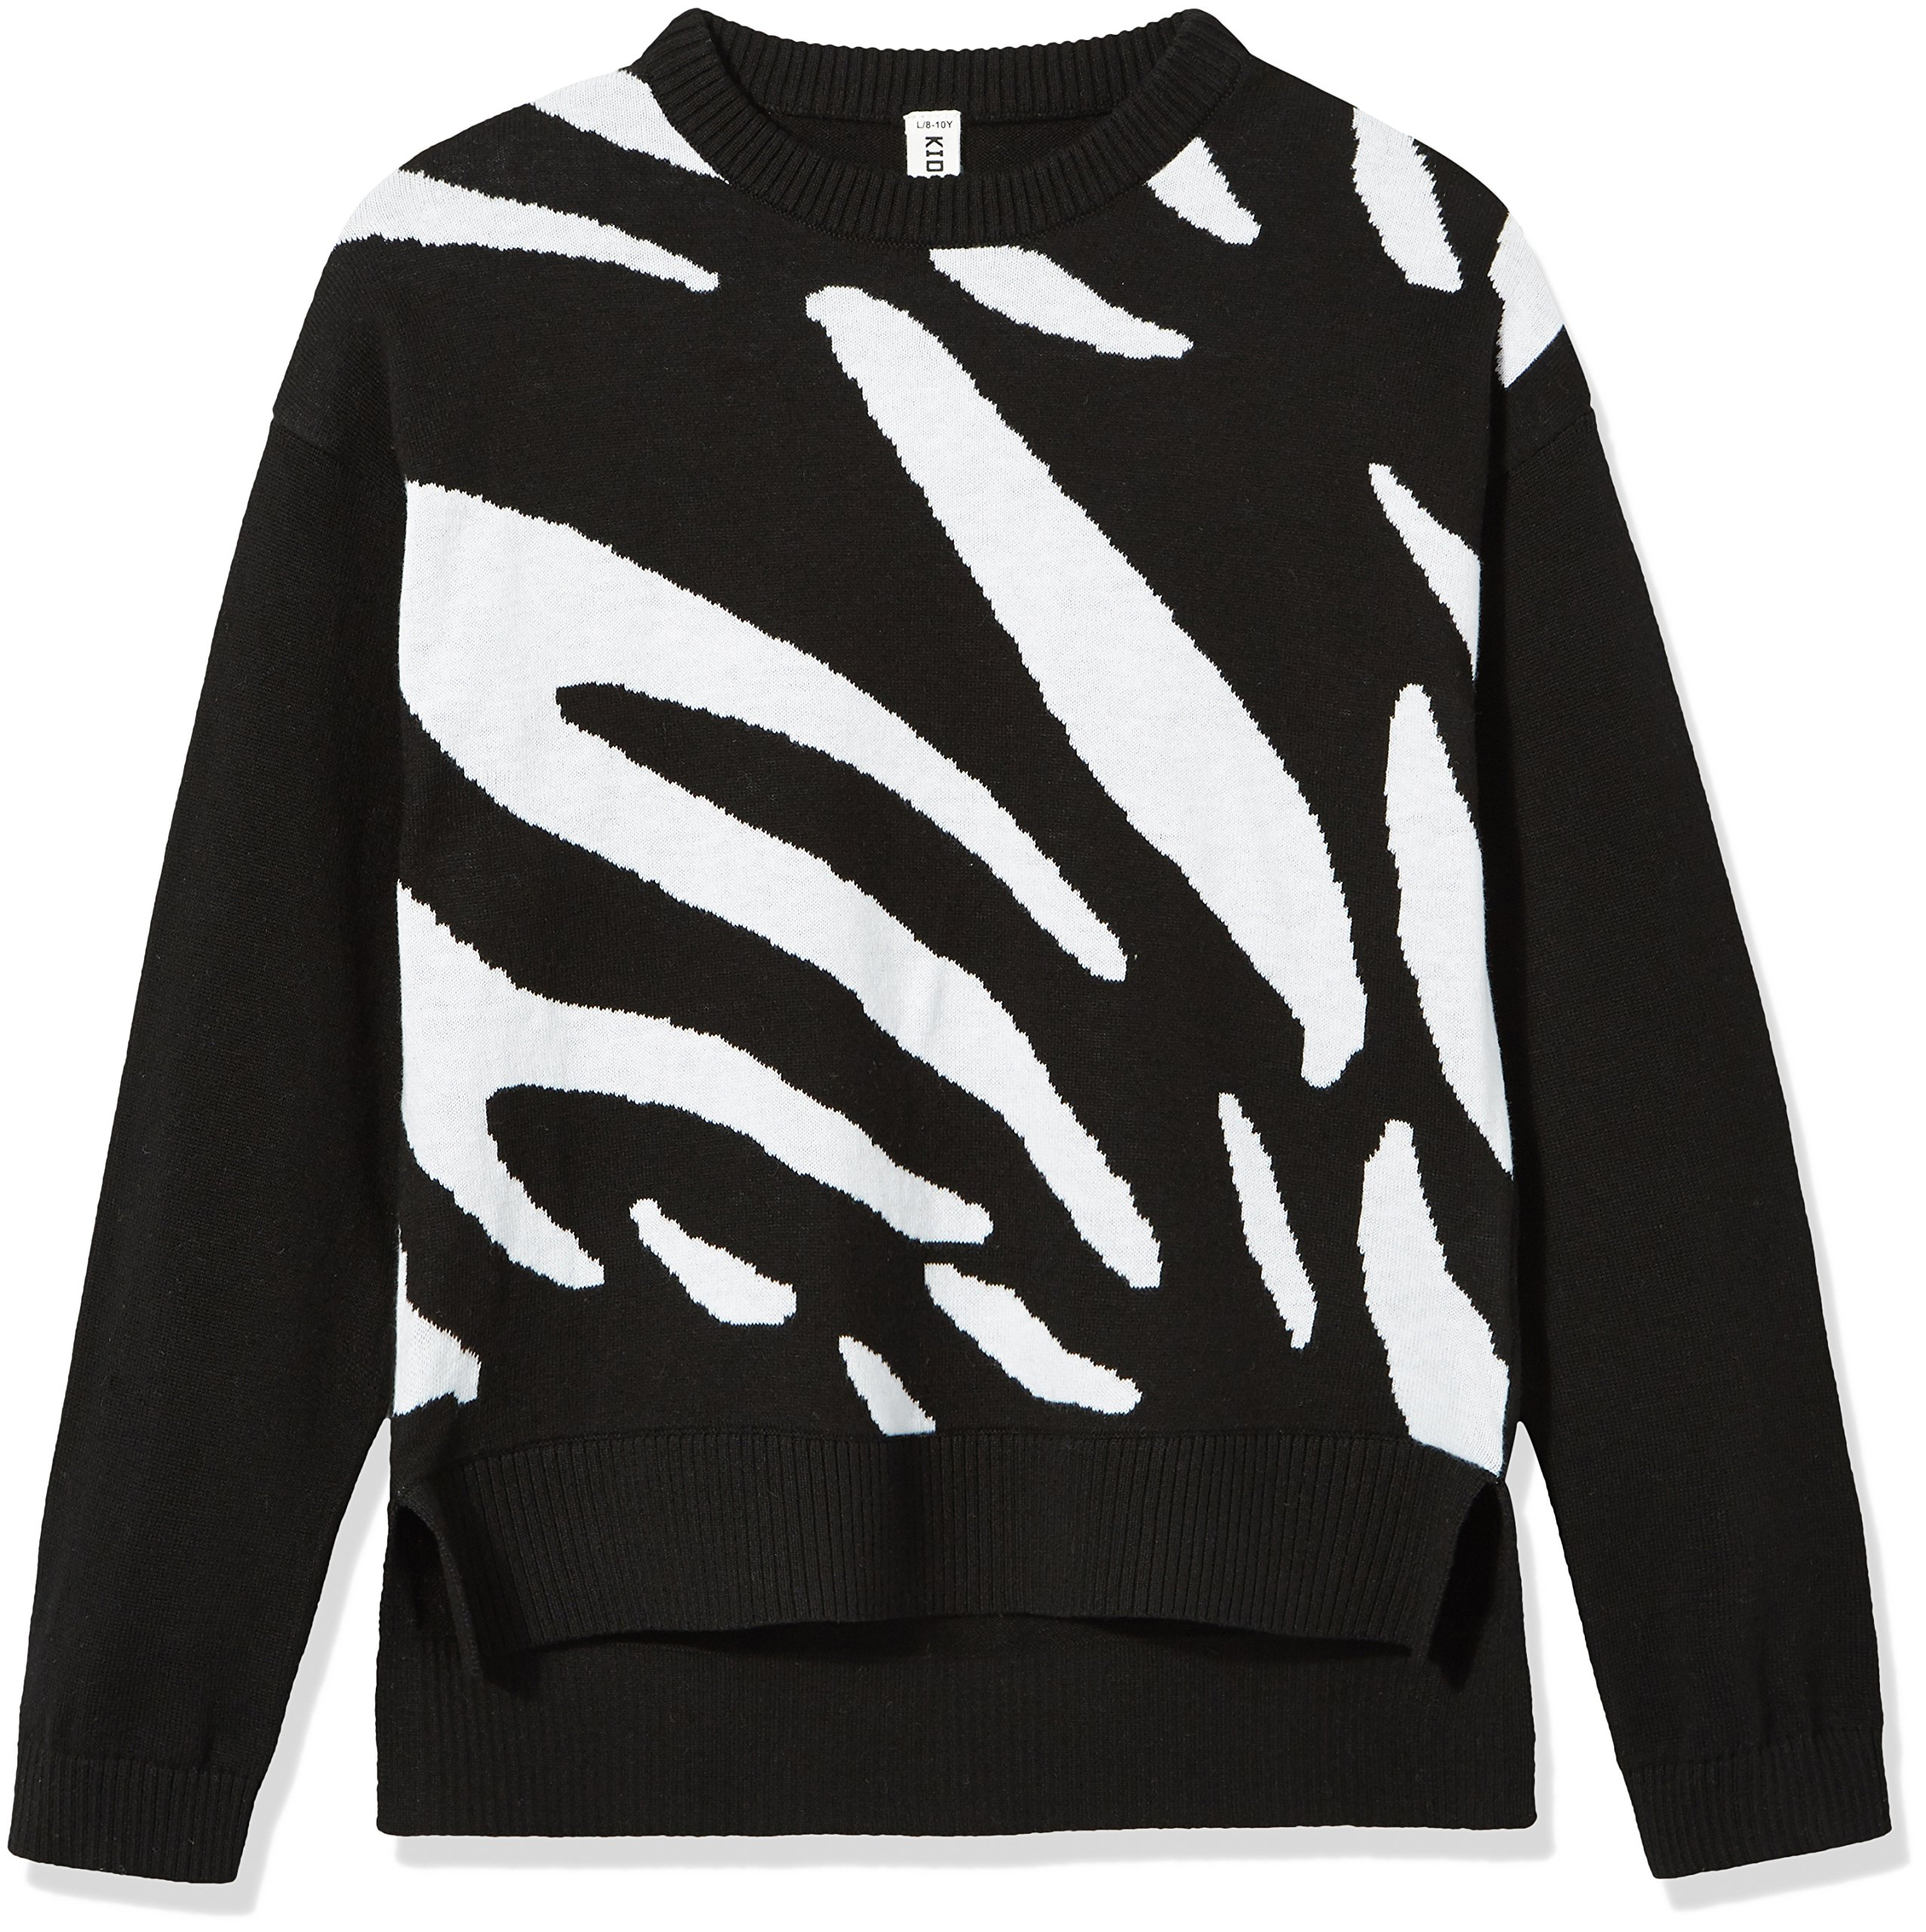 Kid Nation Girls' Long Sleeve Pullover Size S Black